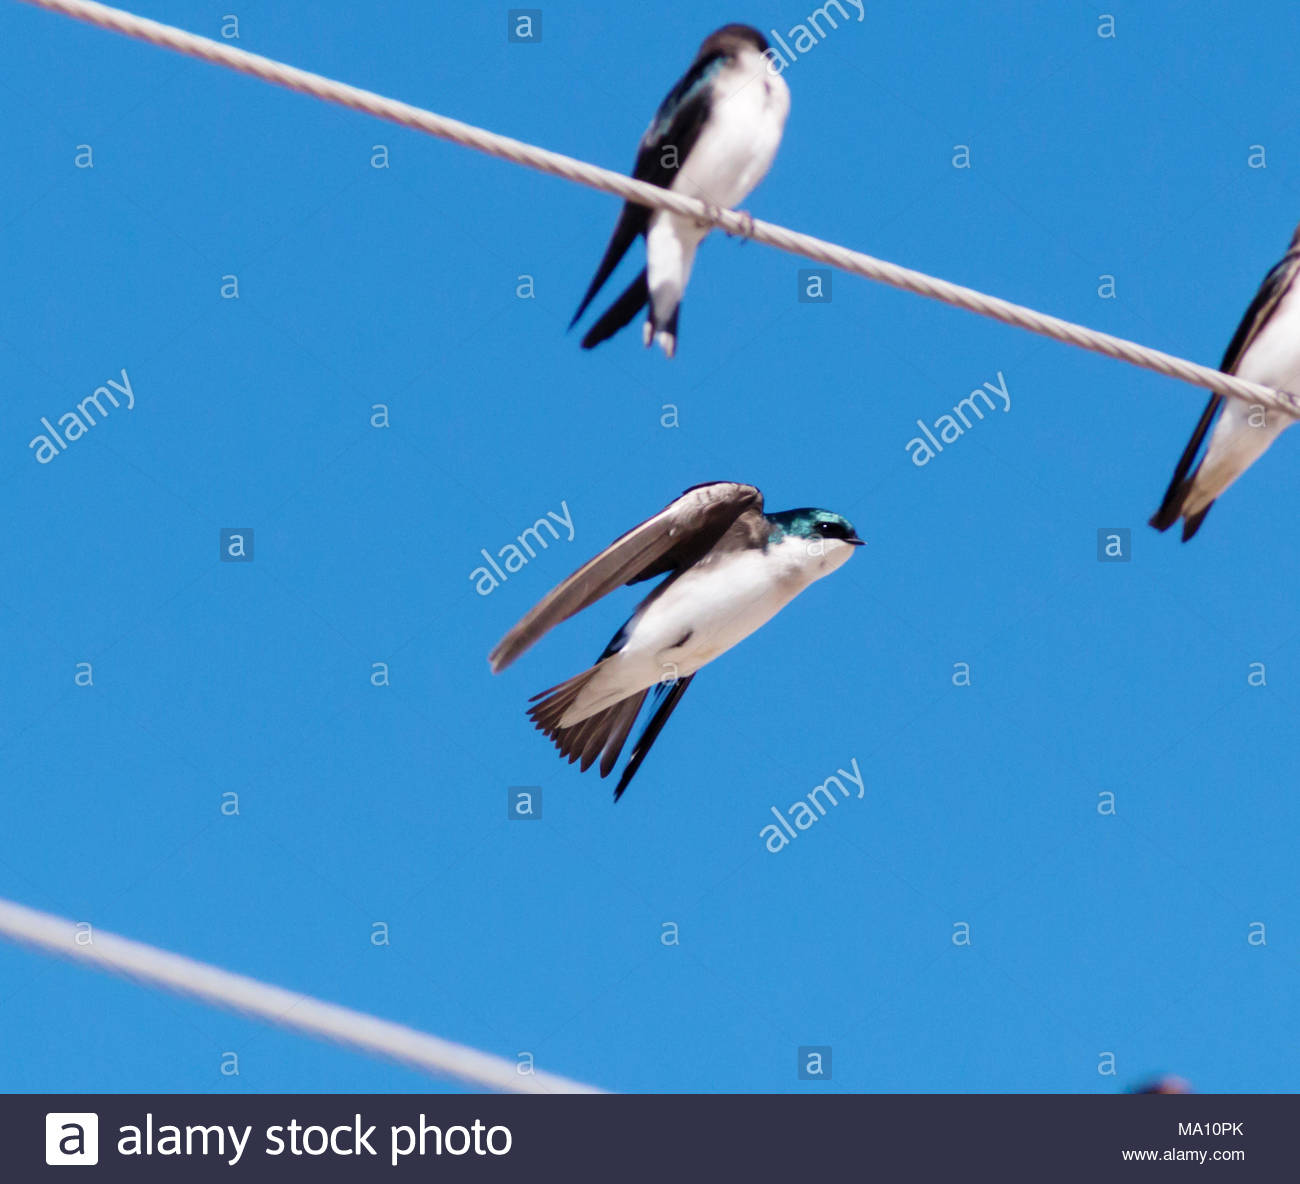 Tree Swallow, Tachycineta bicolor, flying, Arizona US Stock Photo